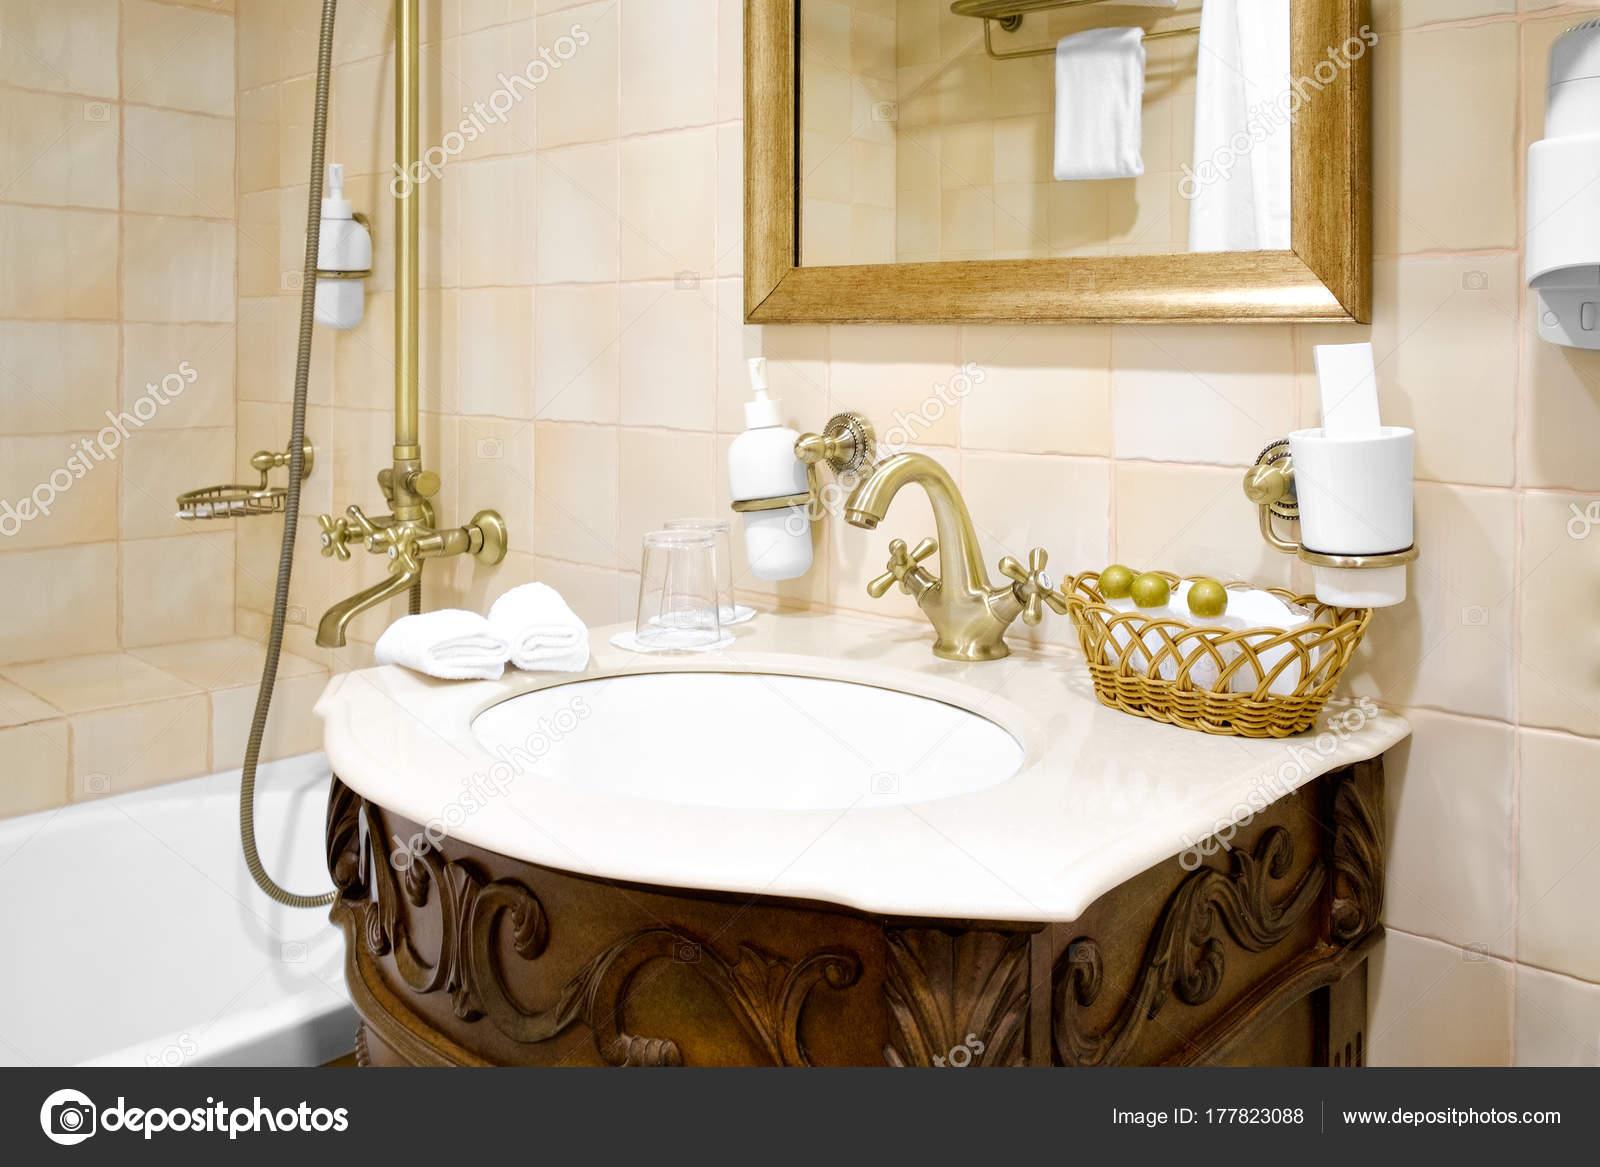 Retro Wandtegels Badkamer : Badkamerverlichting retro douche retro 432071 colonne de douche